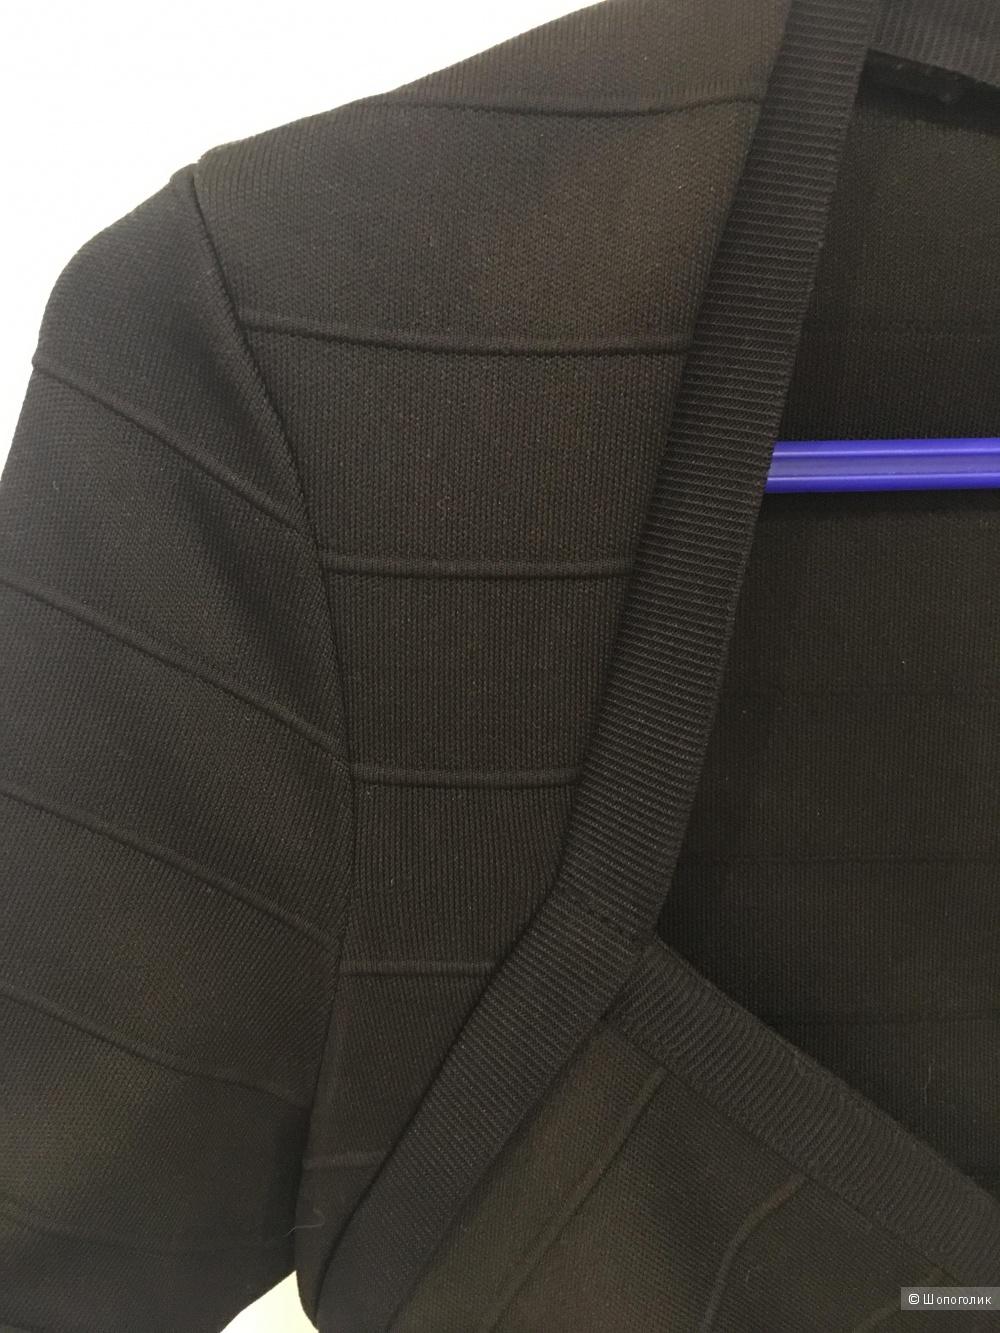 Платье-бандаж, фирма imperial, размер 42